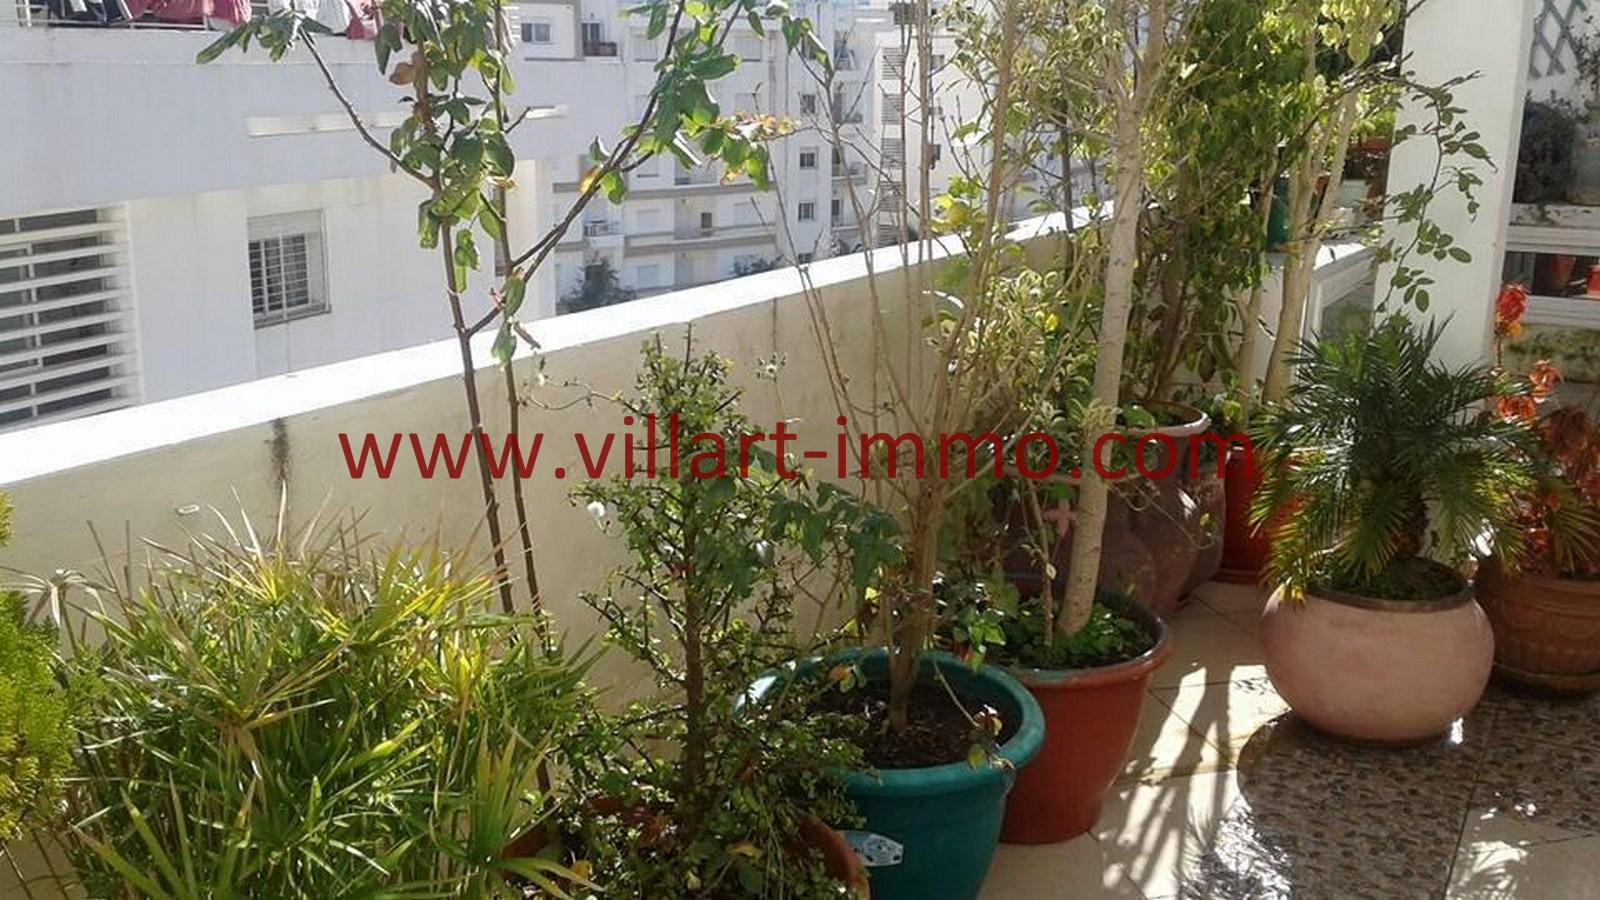 6-Vente-Appartement-Tanger-Route-de-Rabat-Terrasse 2 -VA476-Villart Immo